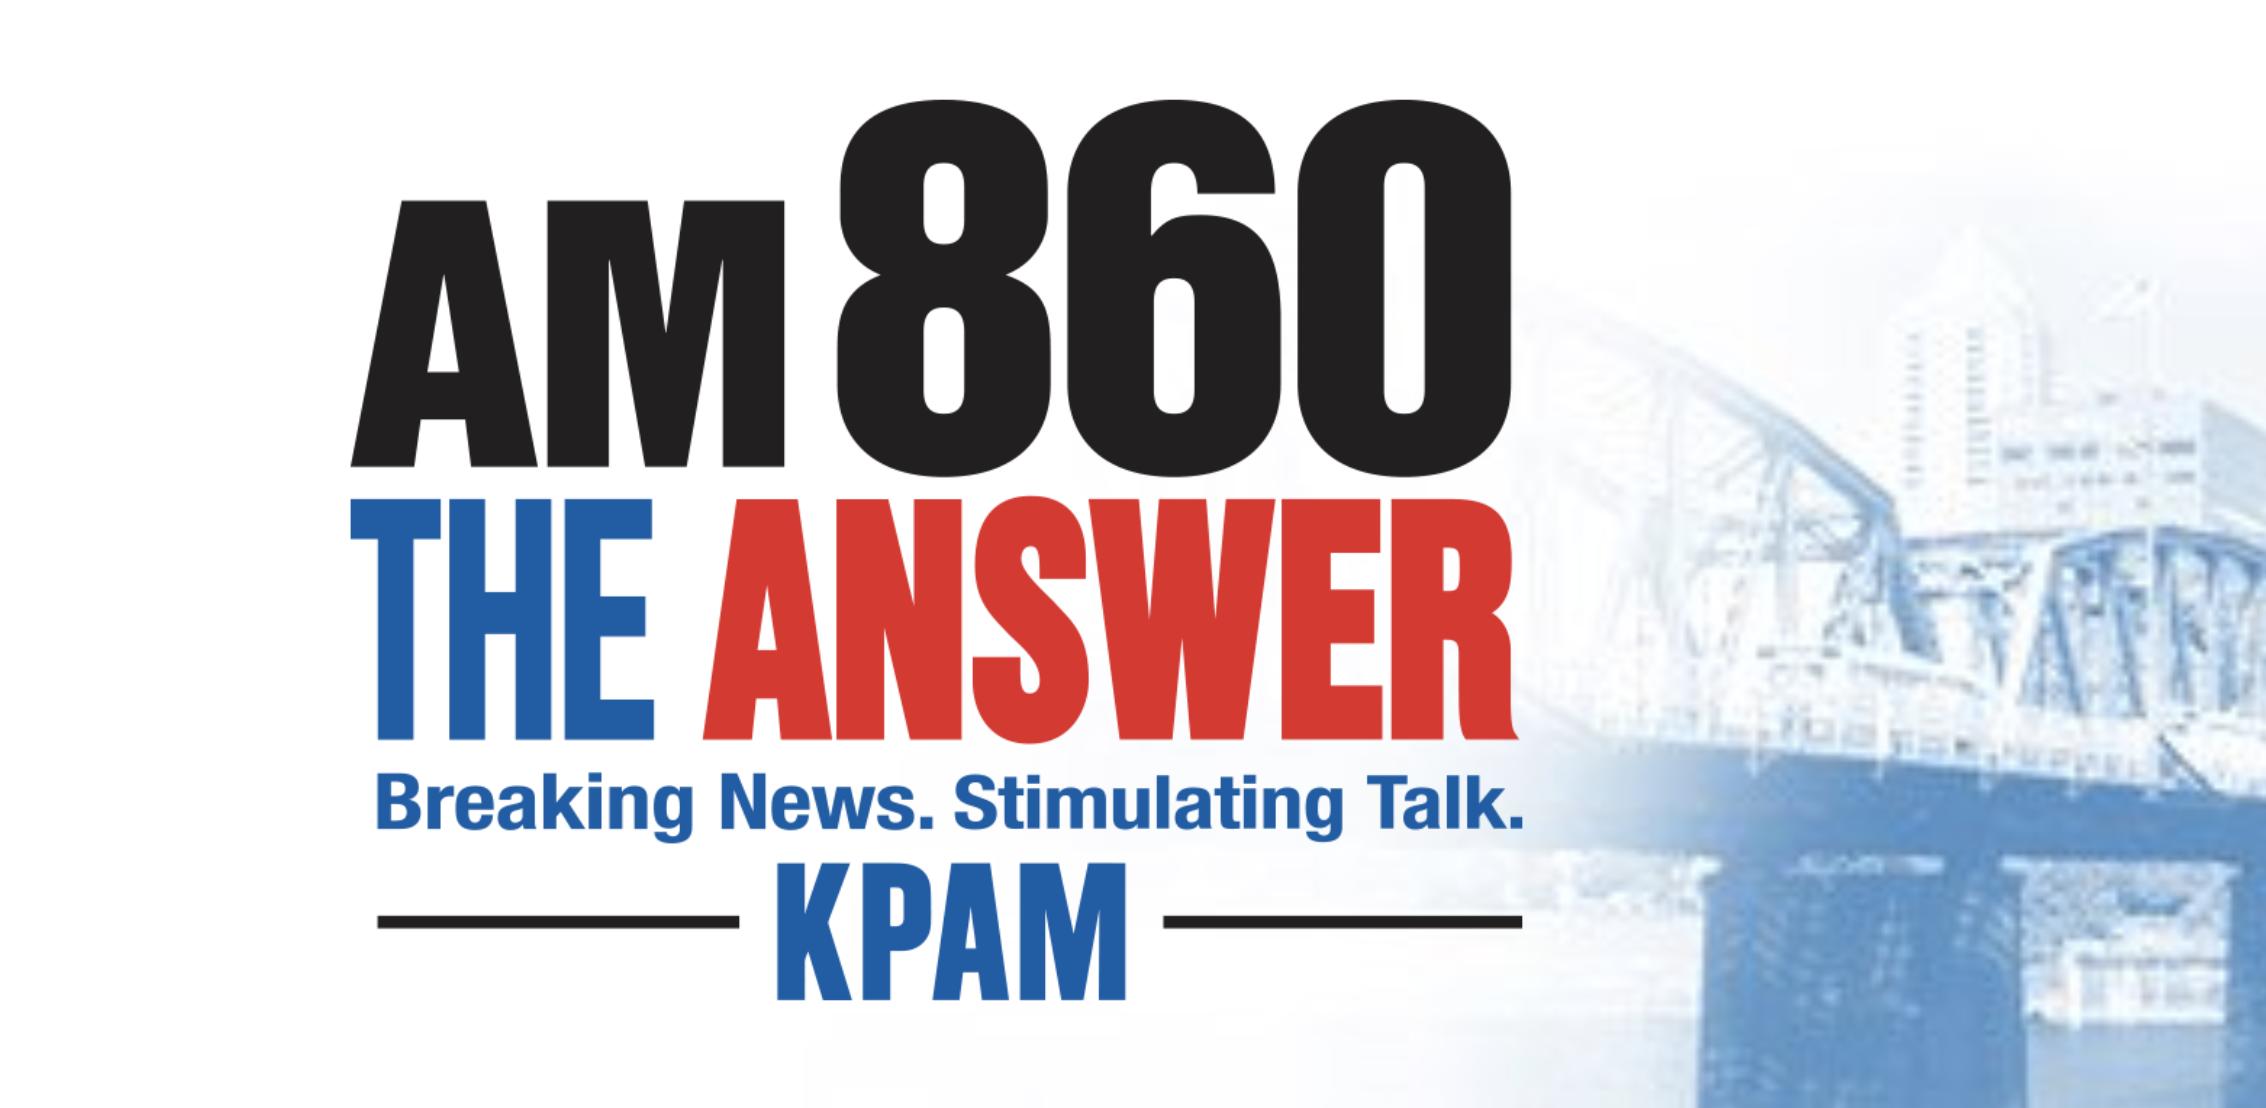 KPAM AM 860 Radio: Interview with Ken Honda